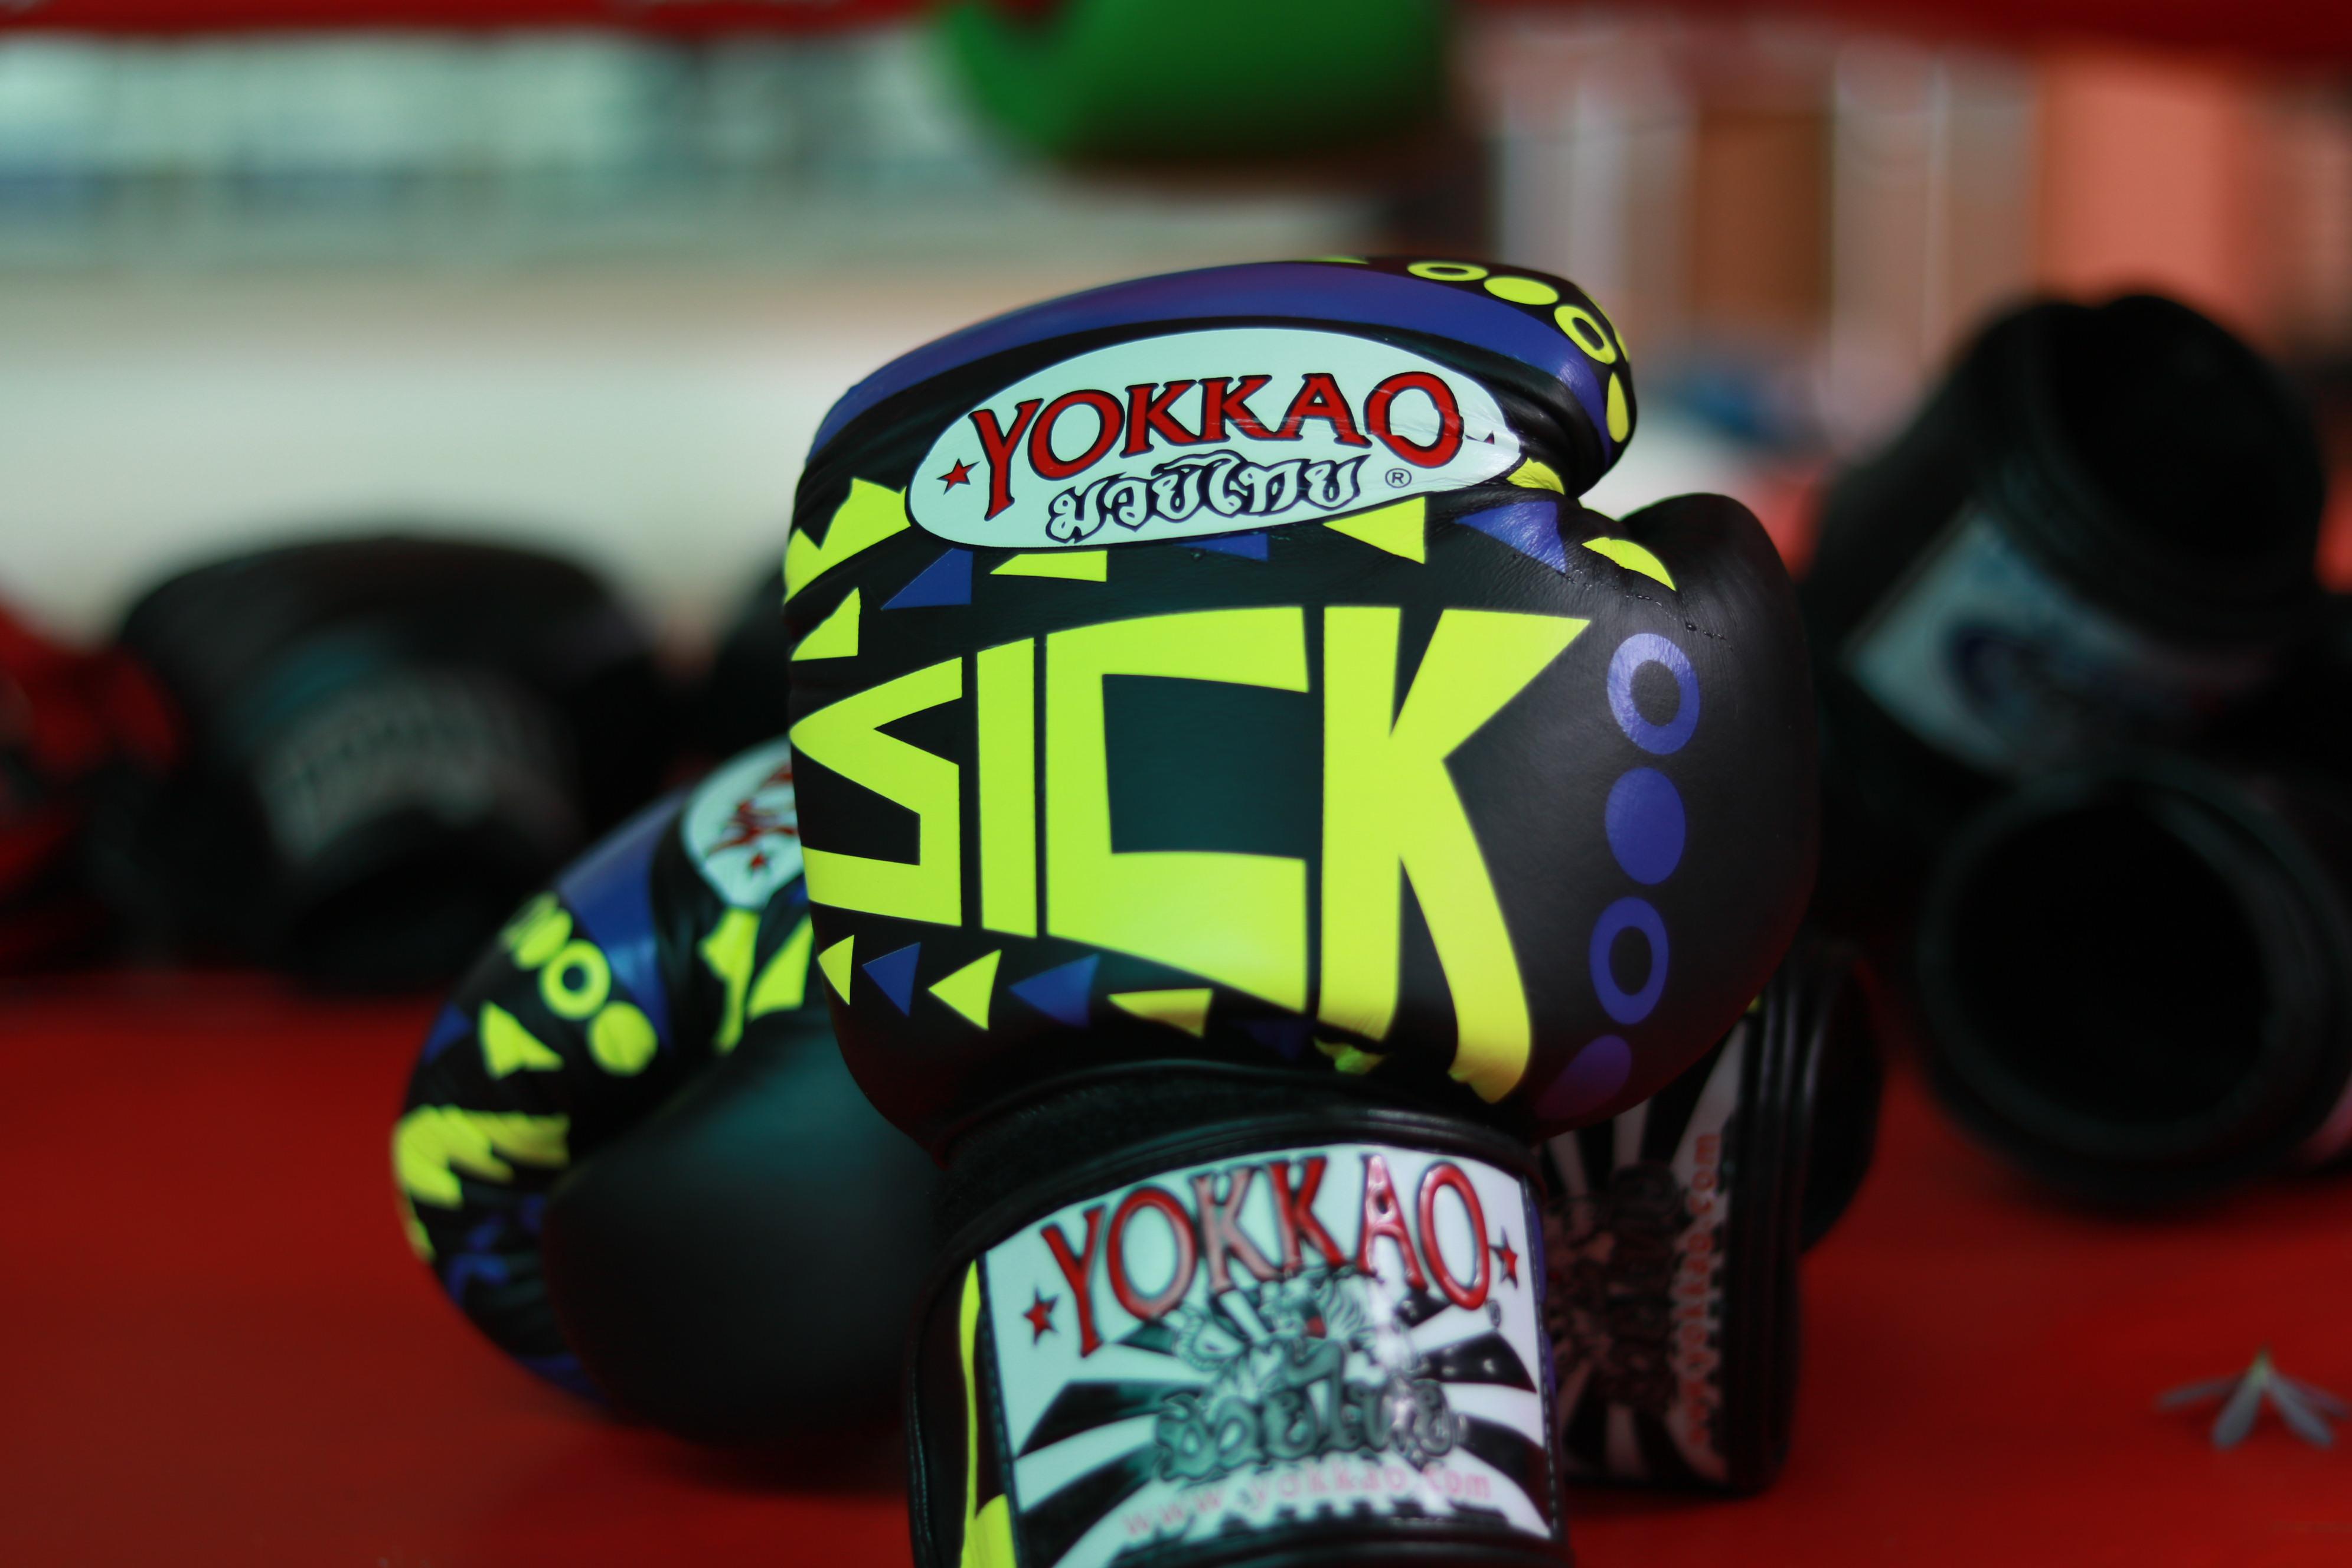 IMG 1886 - Yokkao SICK 12oz boxing glove Review